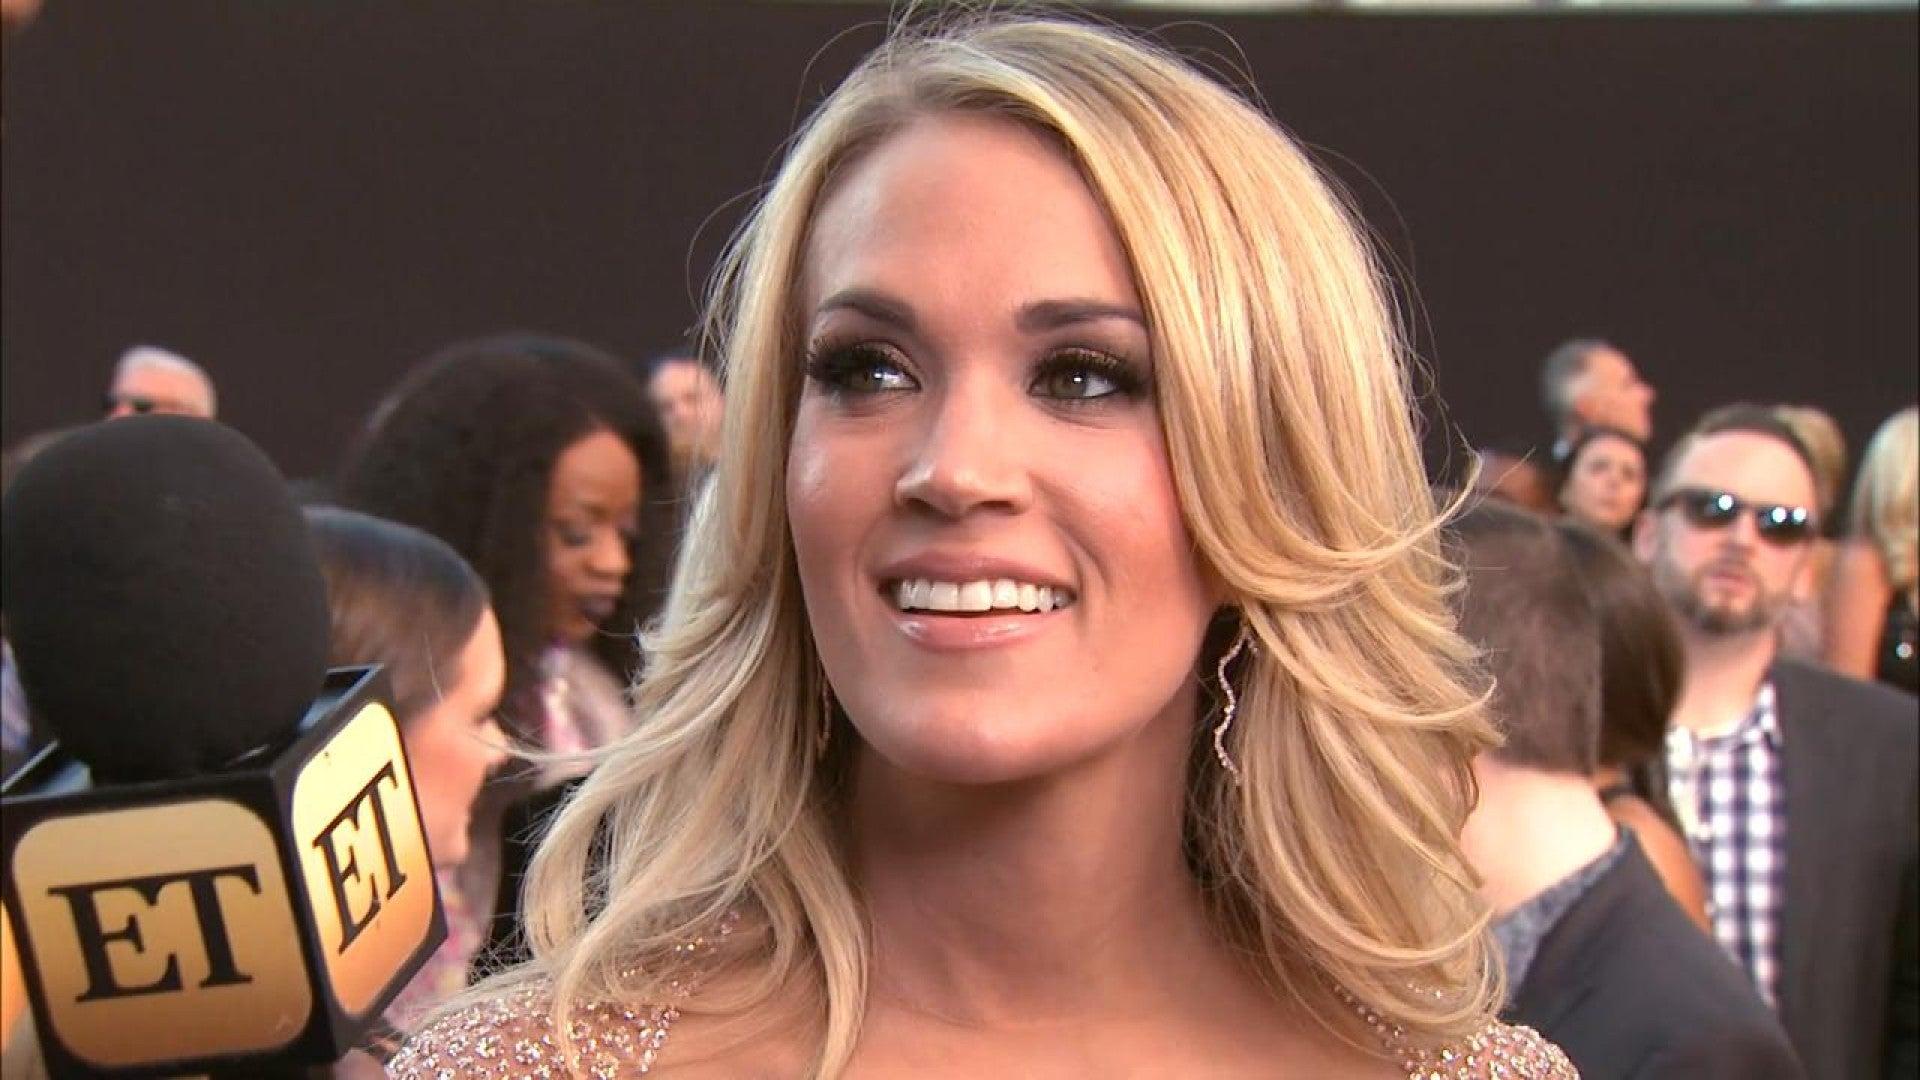 Carrie Underwood Dishes On Motherhood Says Blake Shelton And